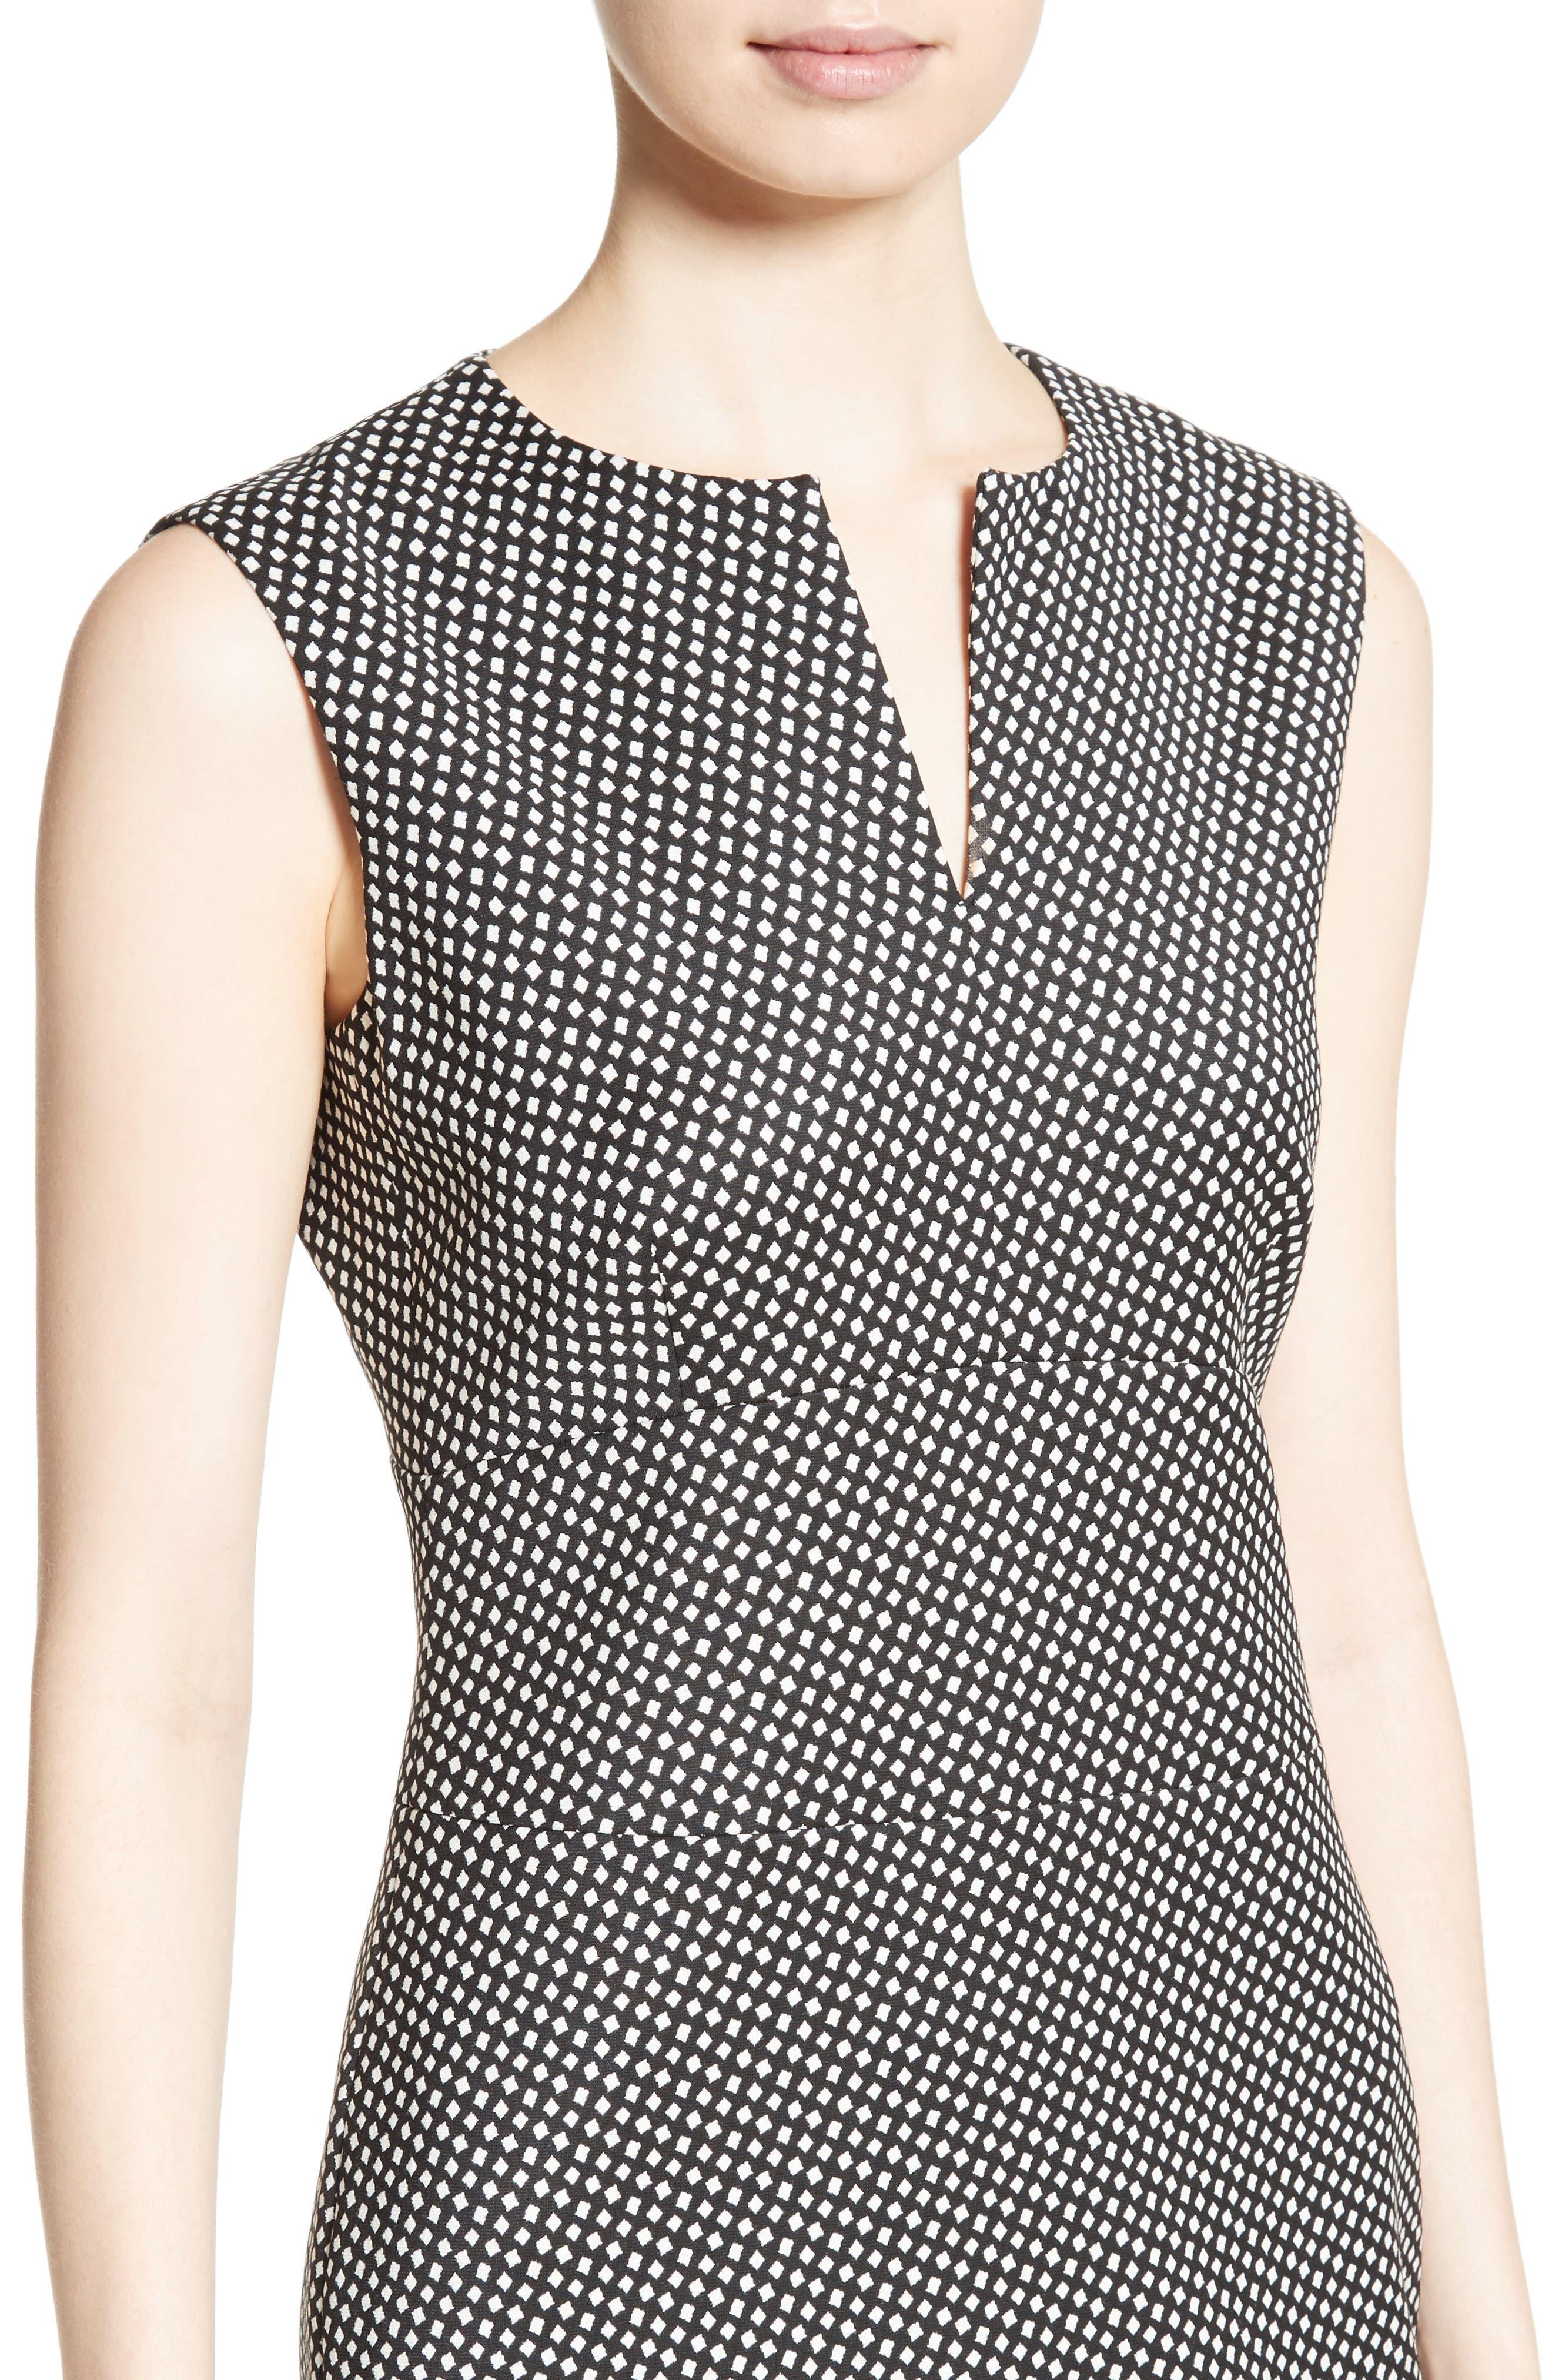 Cerea Sheath Dress,                             Alternate thumbnail 6, color,                             Black